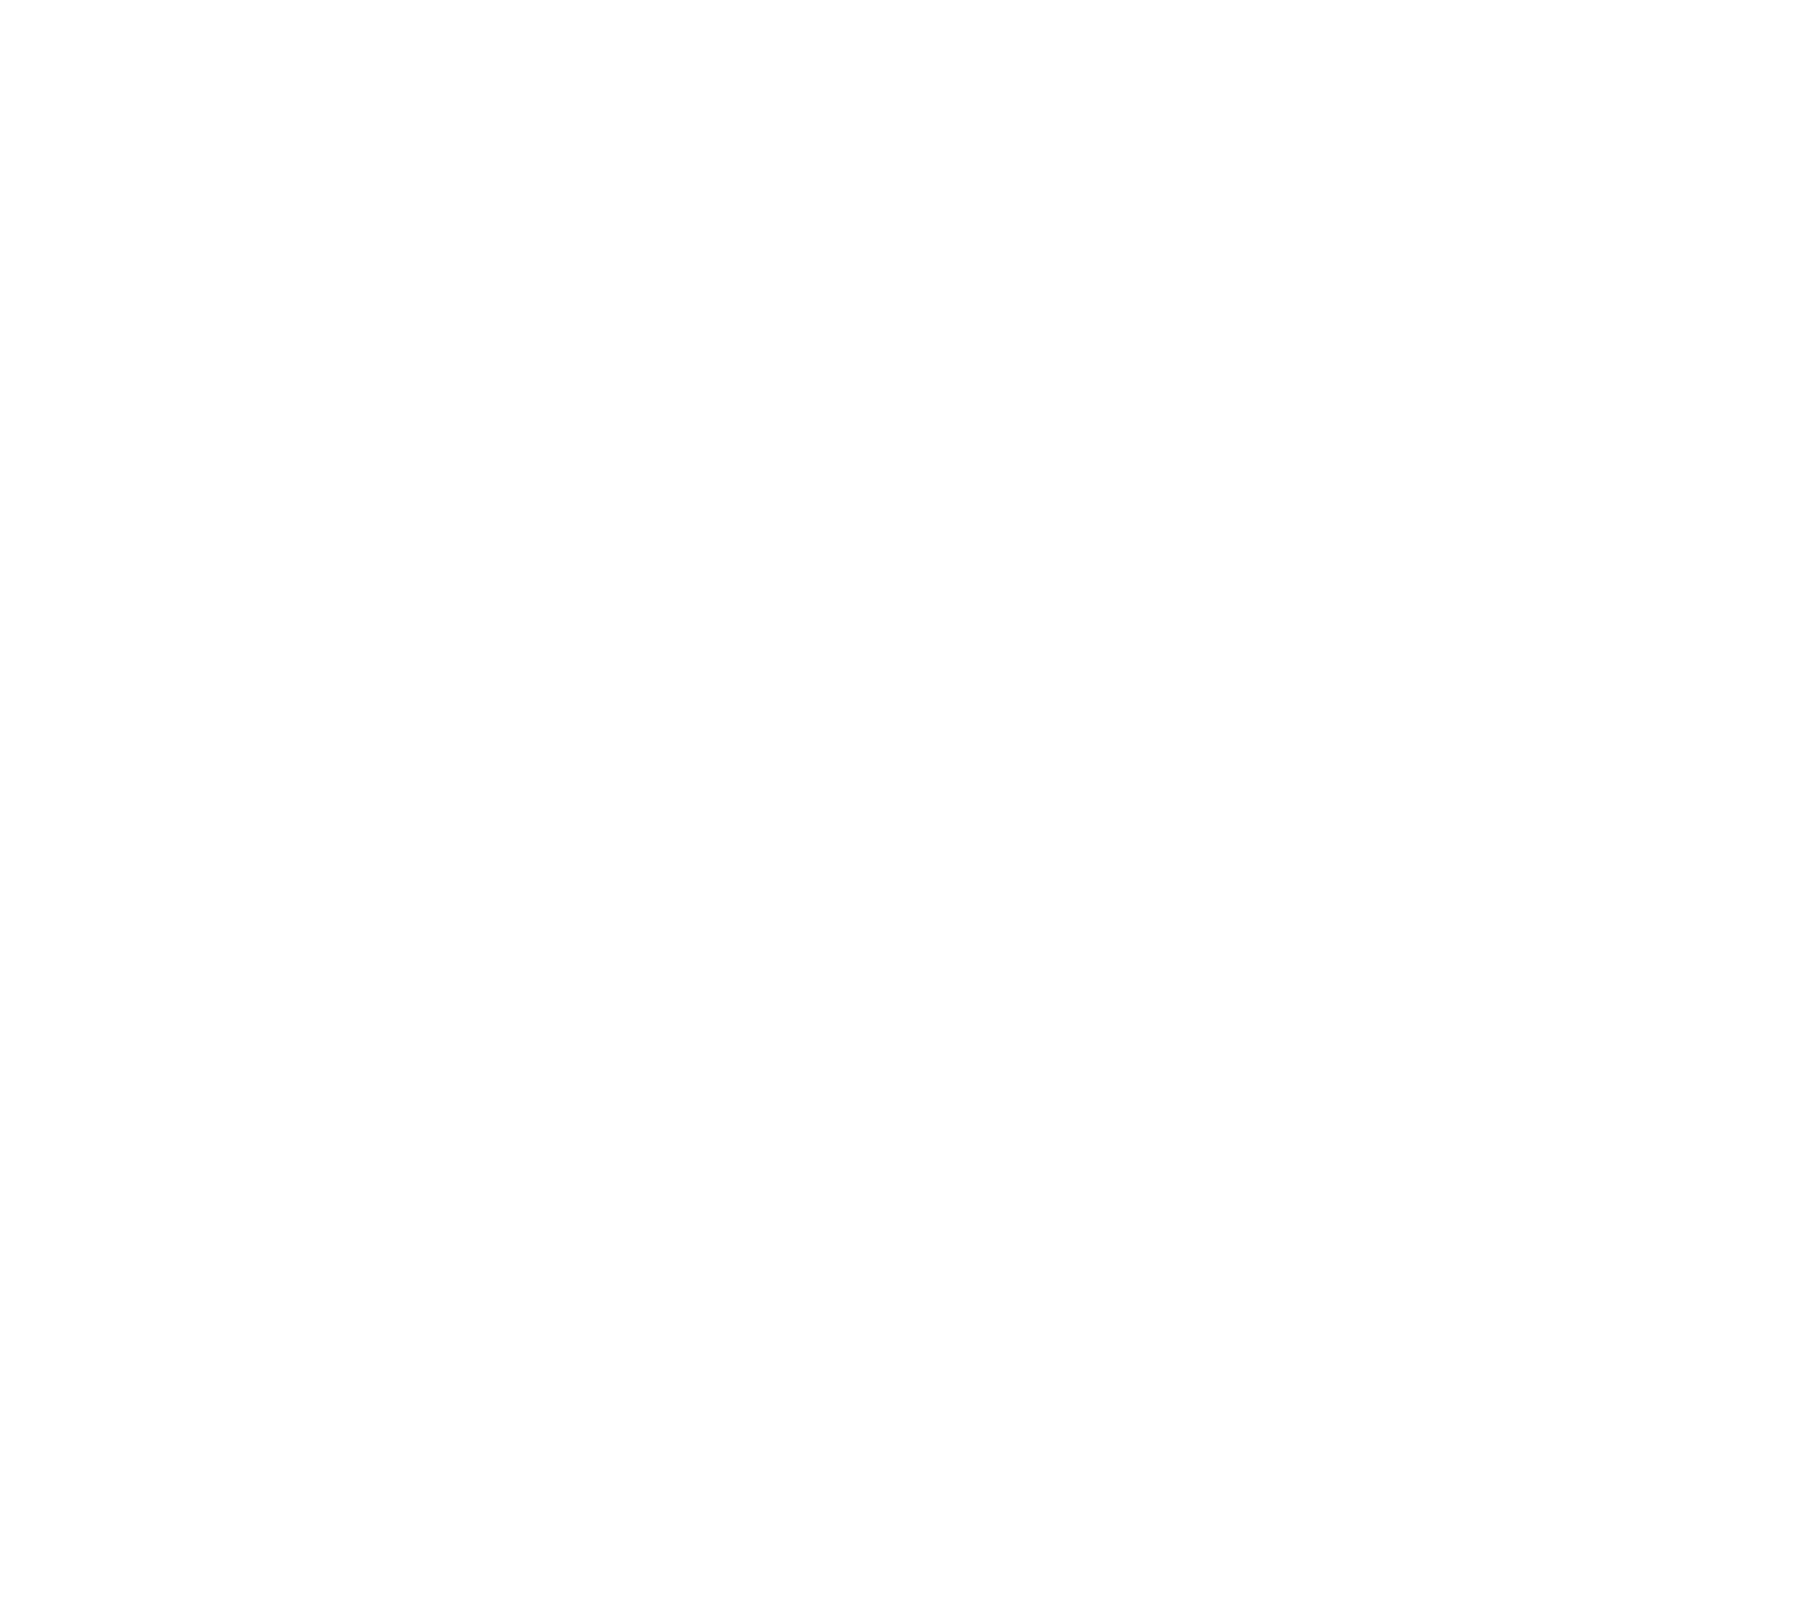 https://eqoxdgod6do.exactdn.com/wp-content/uploads/2021/02/Office-5-scaled-e1612977538597.jpeg?strip=all&lossy=1&w=1920&ssl=1